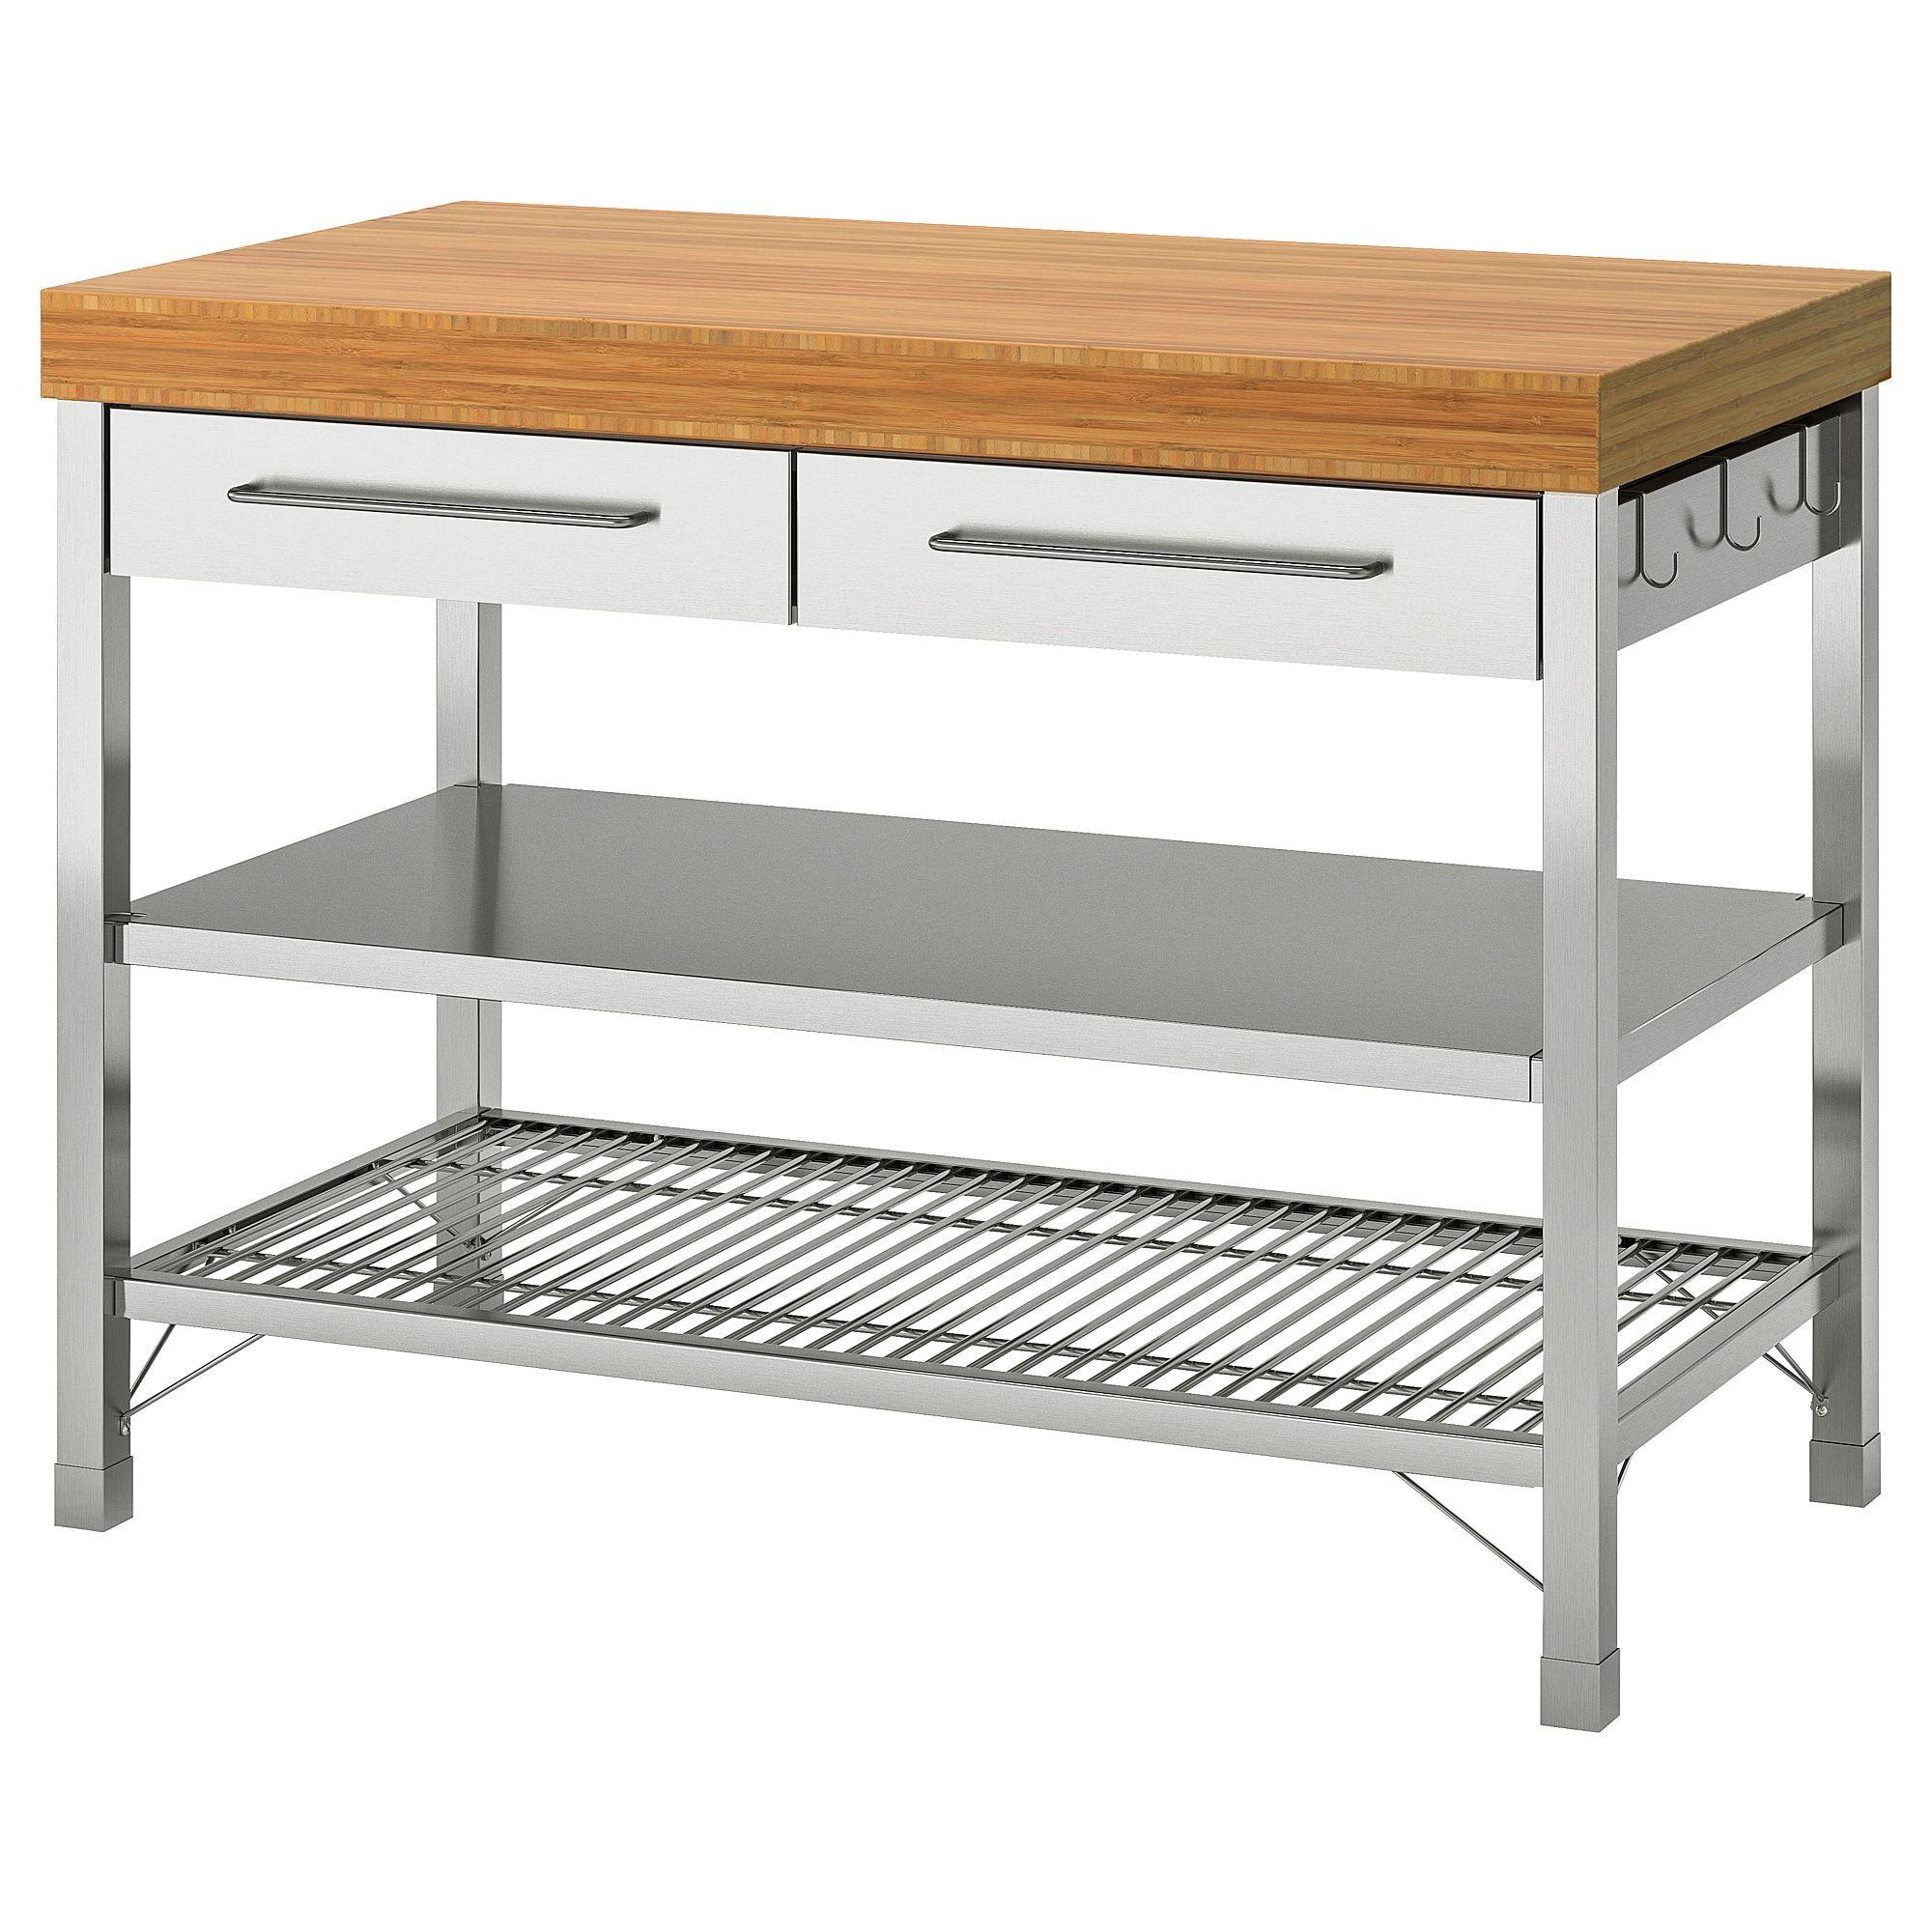 Rimforsa Werkbank Roestvrij Staal Bamboe Ikea Ikea Kitchen Island Cart Ikea Workbench